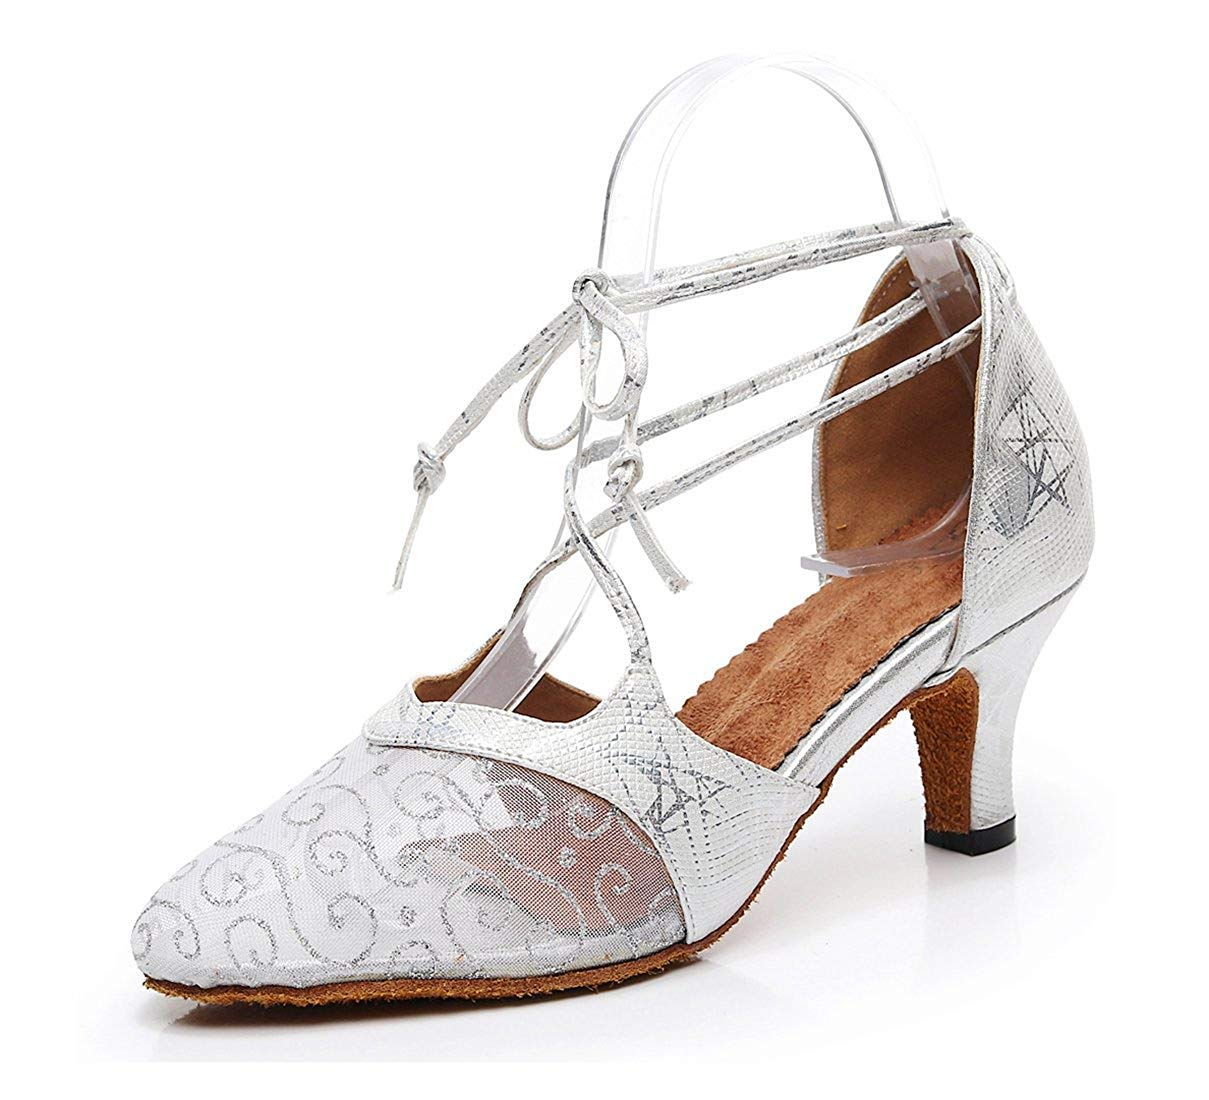 Qiusa Damen Floral gedruckt Silber Mesh Mandel Toe Latin Tanzschuhe Hochzeit Pumps UK 4 (Farbe   - Größe   -)